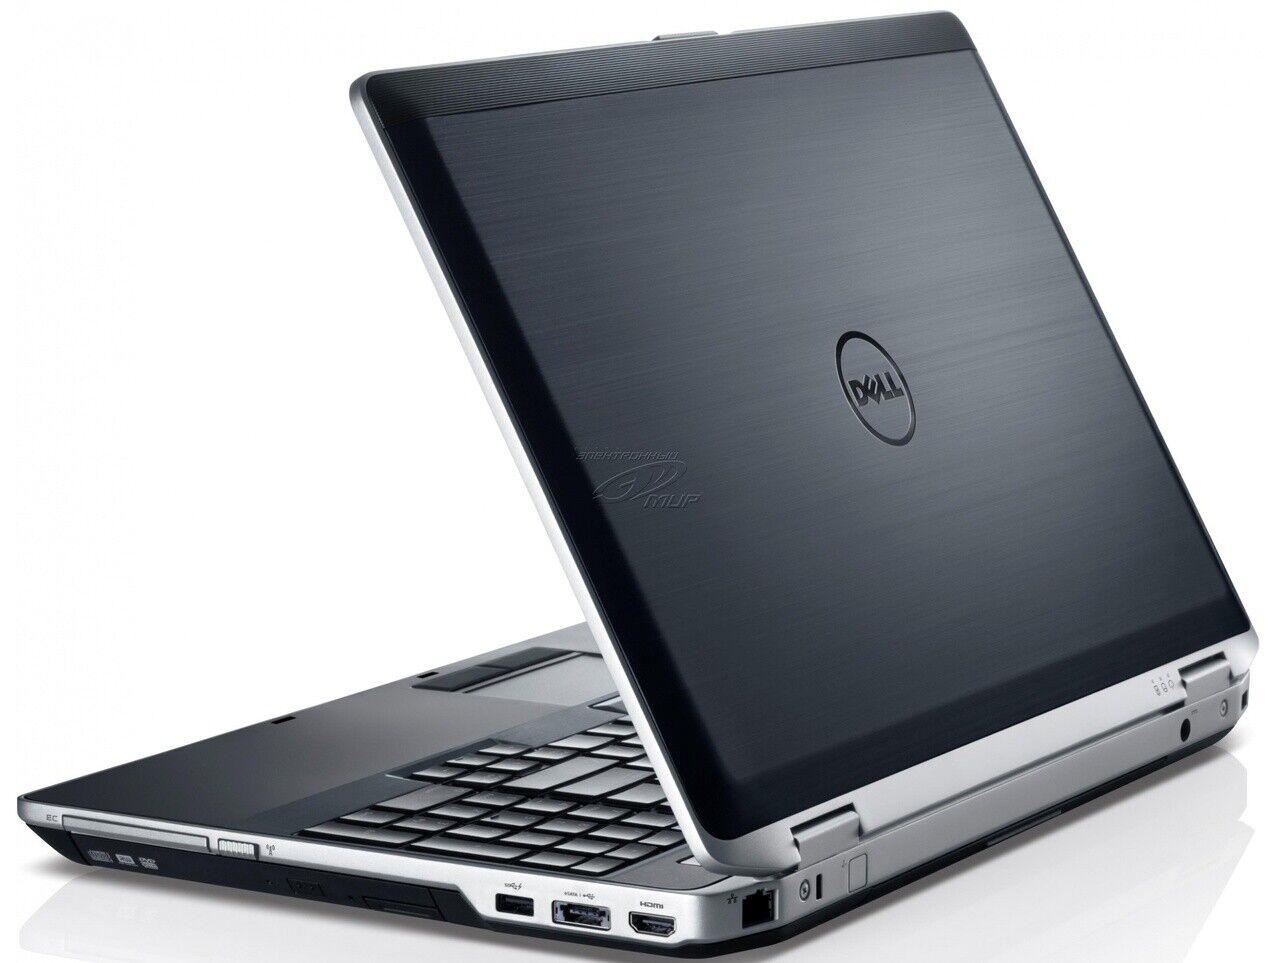 Laptop Windows - Dell Gaming laptop Intel Core i5 3RD Gen 3380 2.90GHz  8GB RAM 500GB